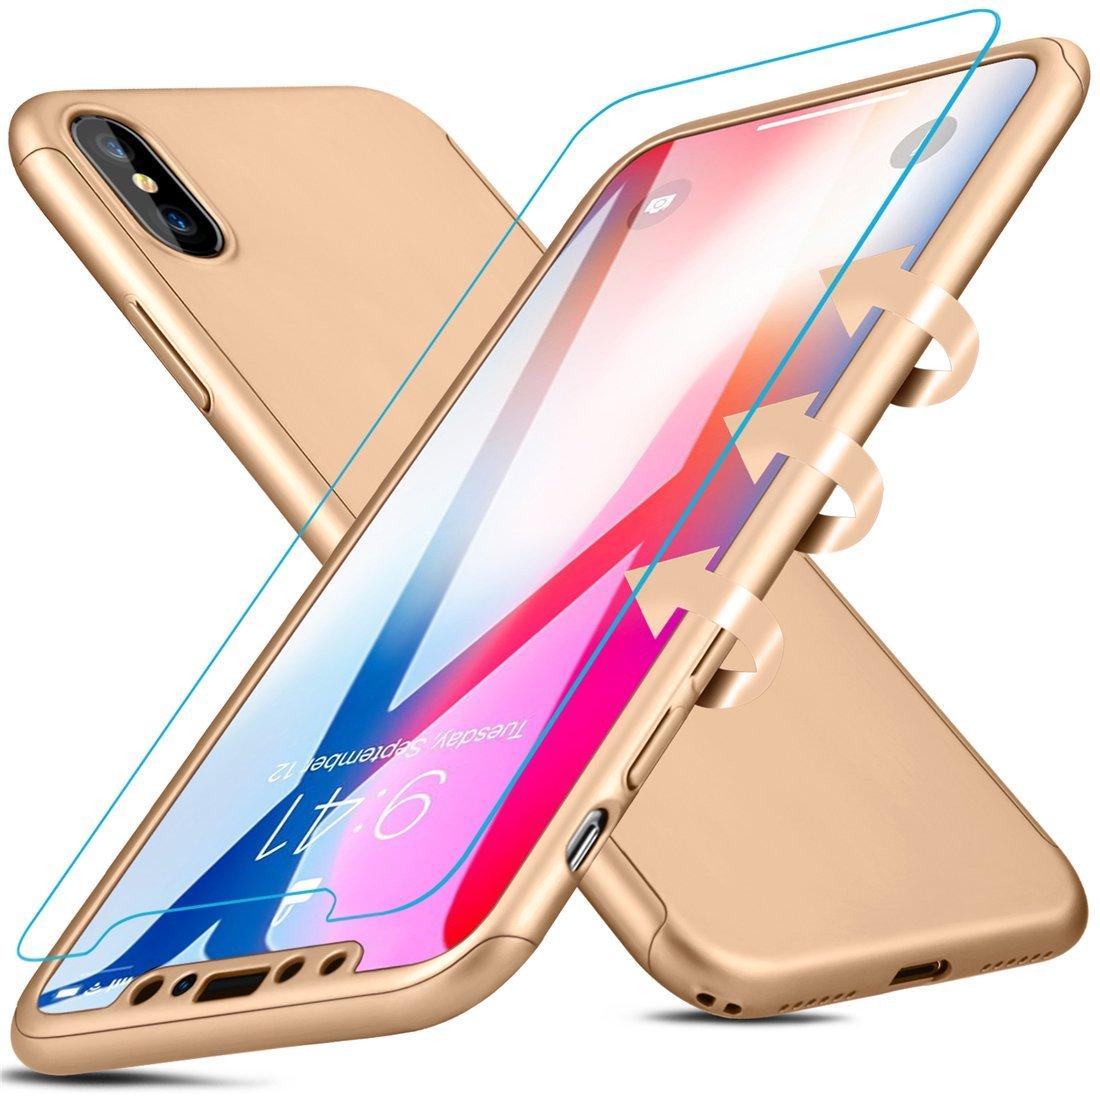 Coque Iphone X intégrale 360° or + film en verre trempé